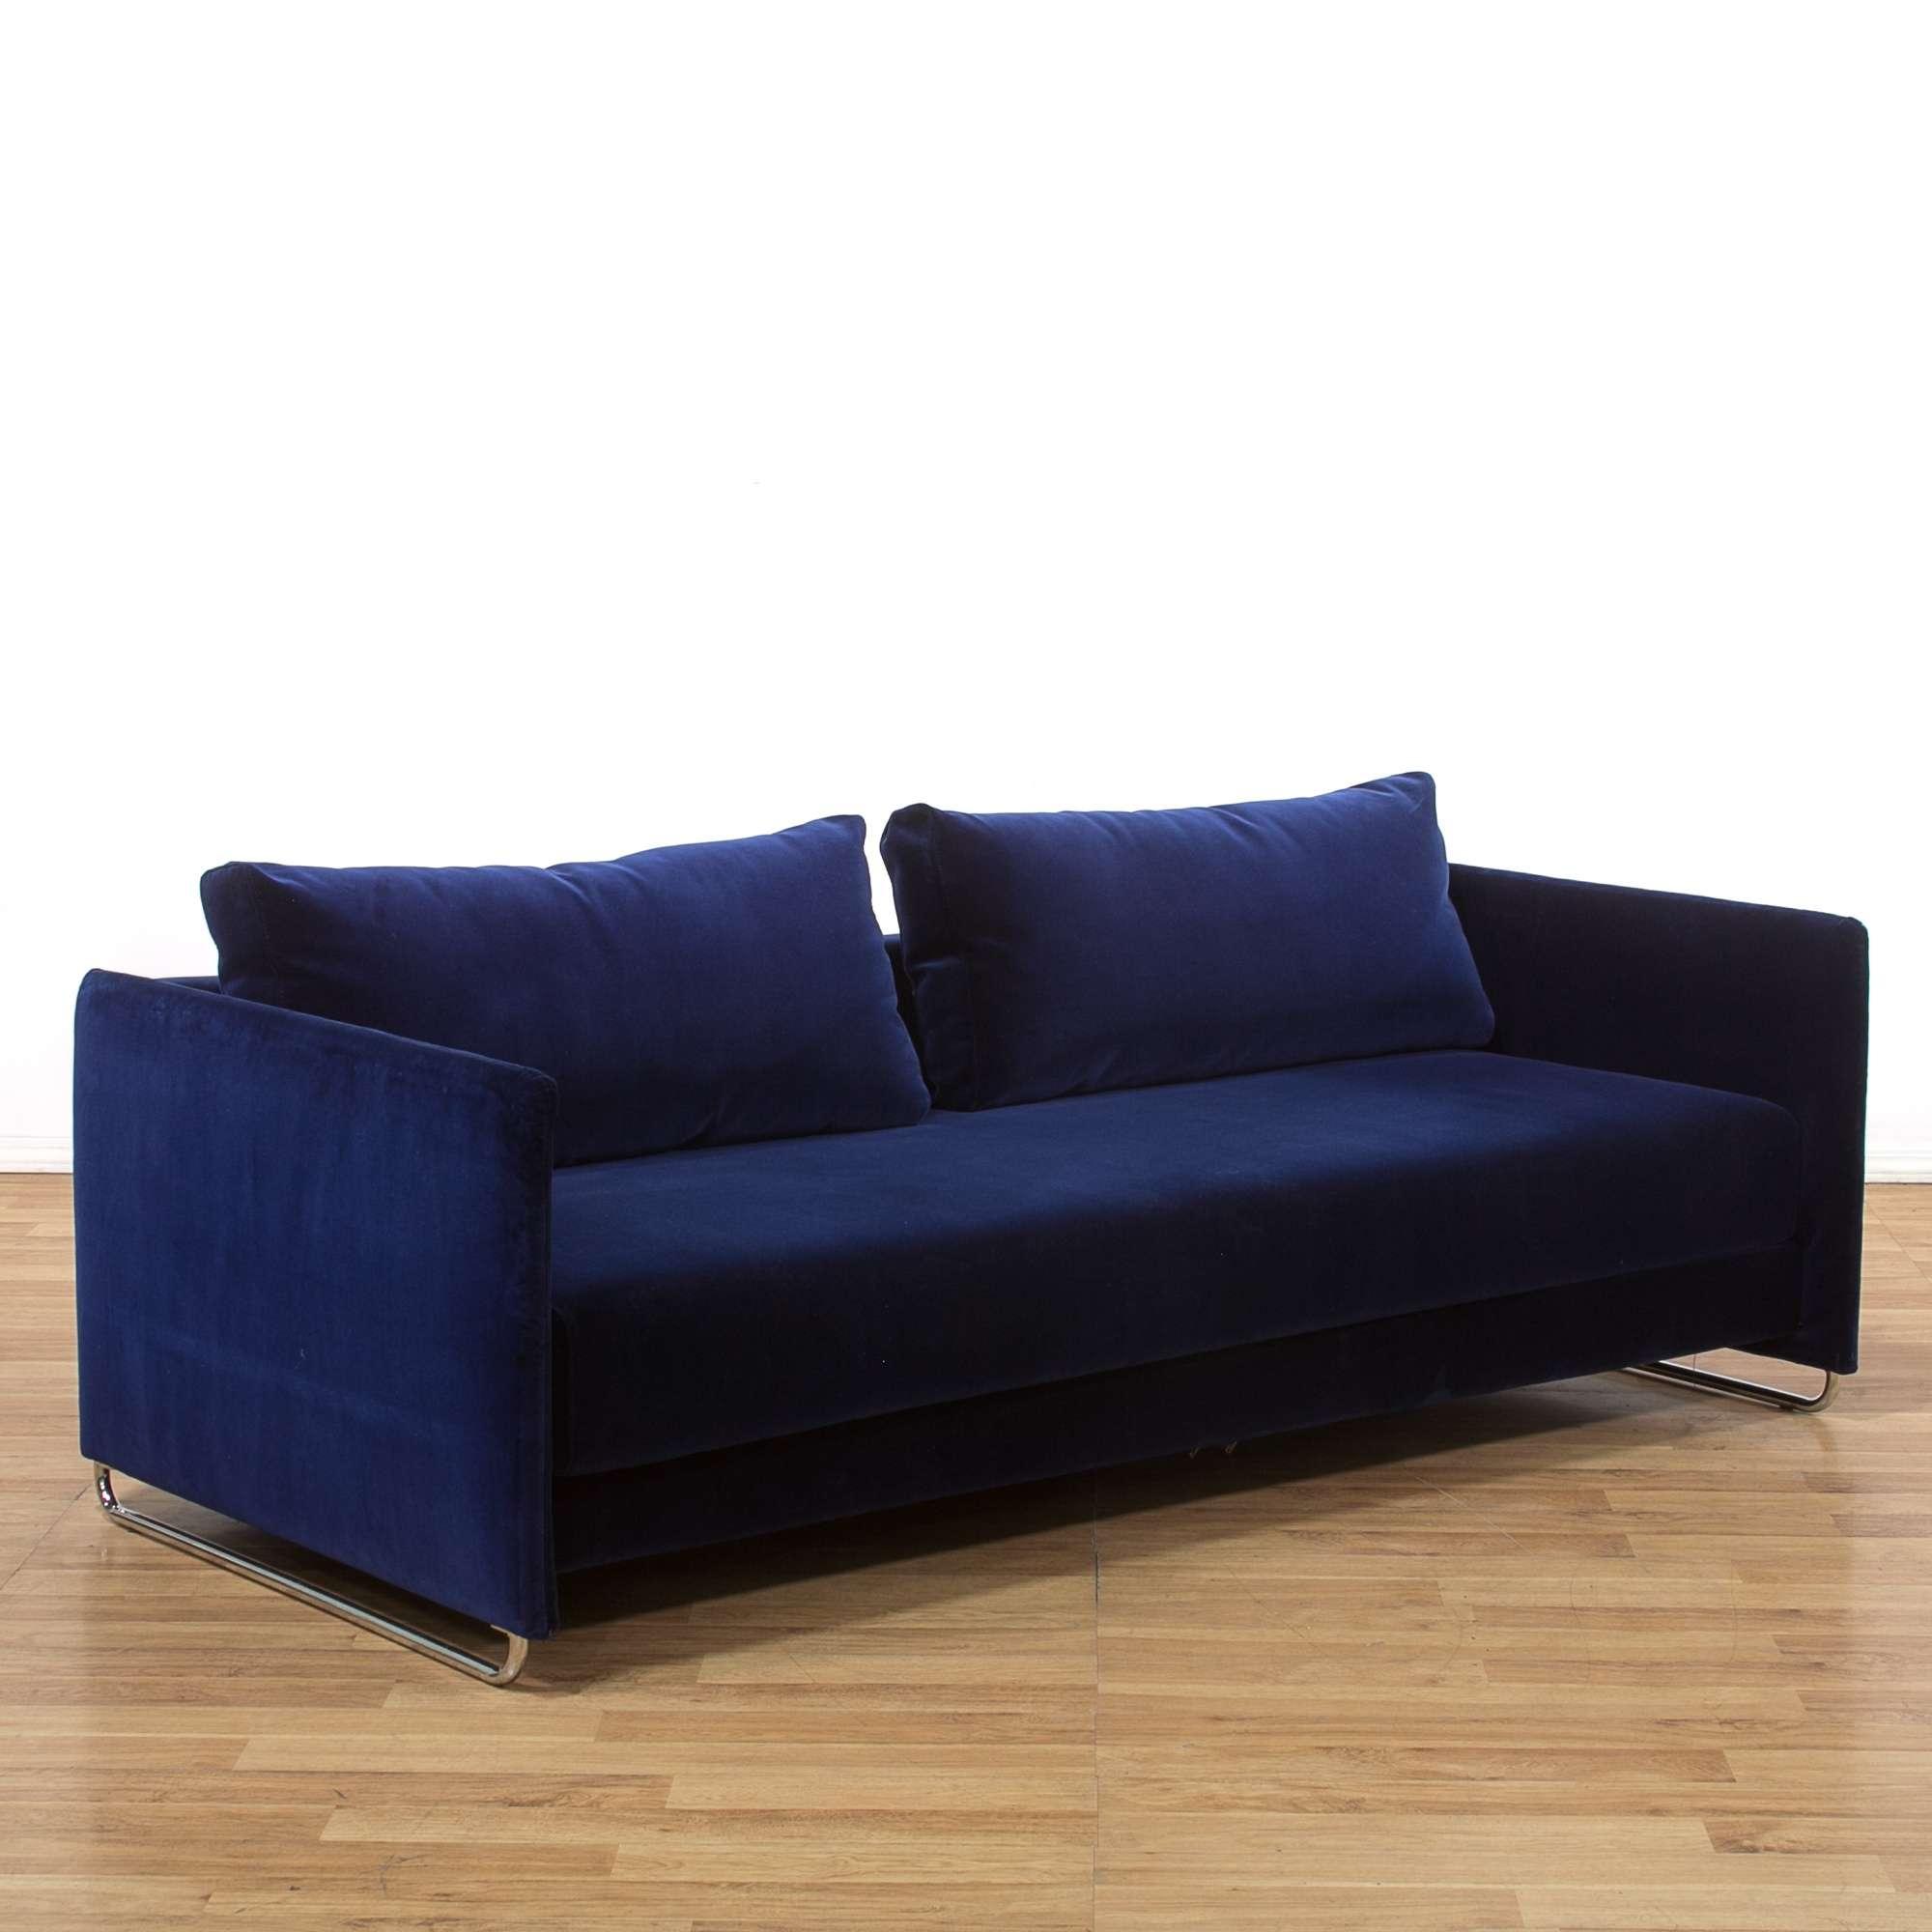 Brilliant Cb2 Tandem Sleeper Sofa In Deep Blue Loveseat Vintage Pdpeps Interior Chair Design Pdpepsorg